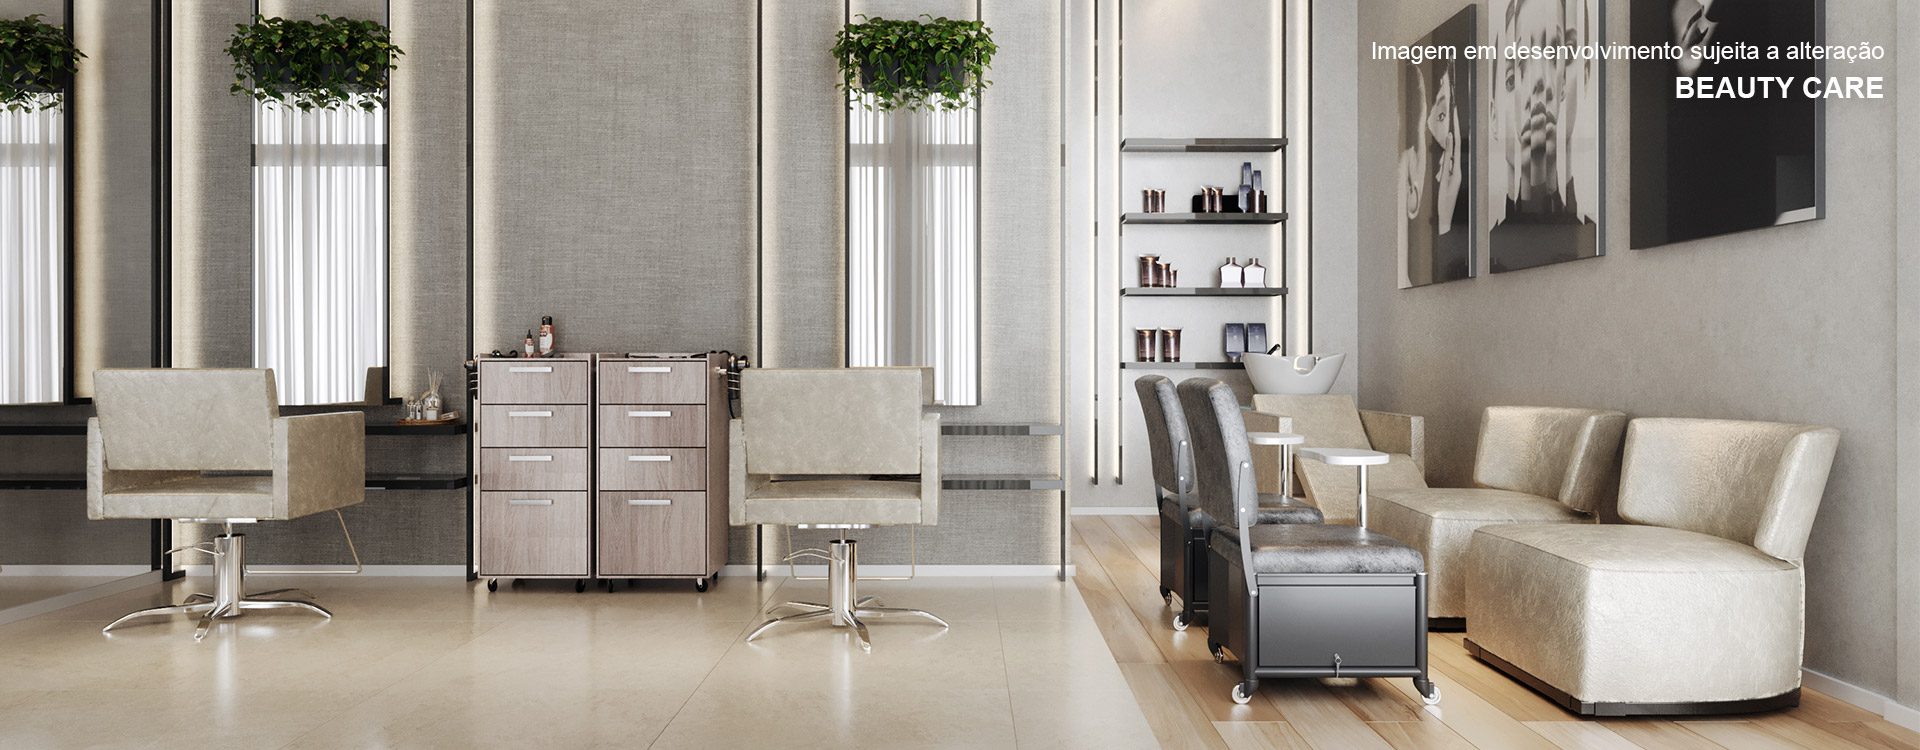 Beauty Care Level Alphaville